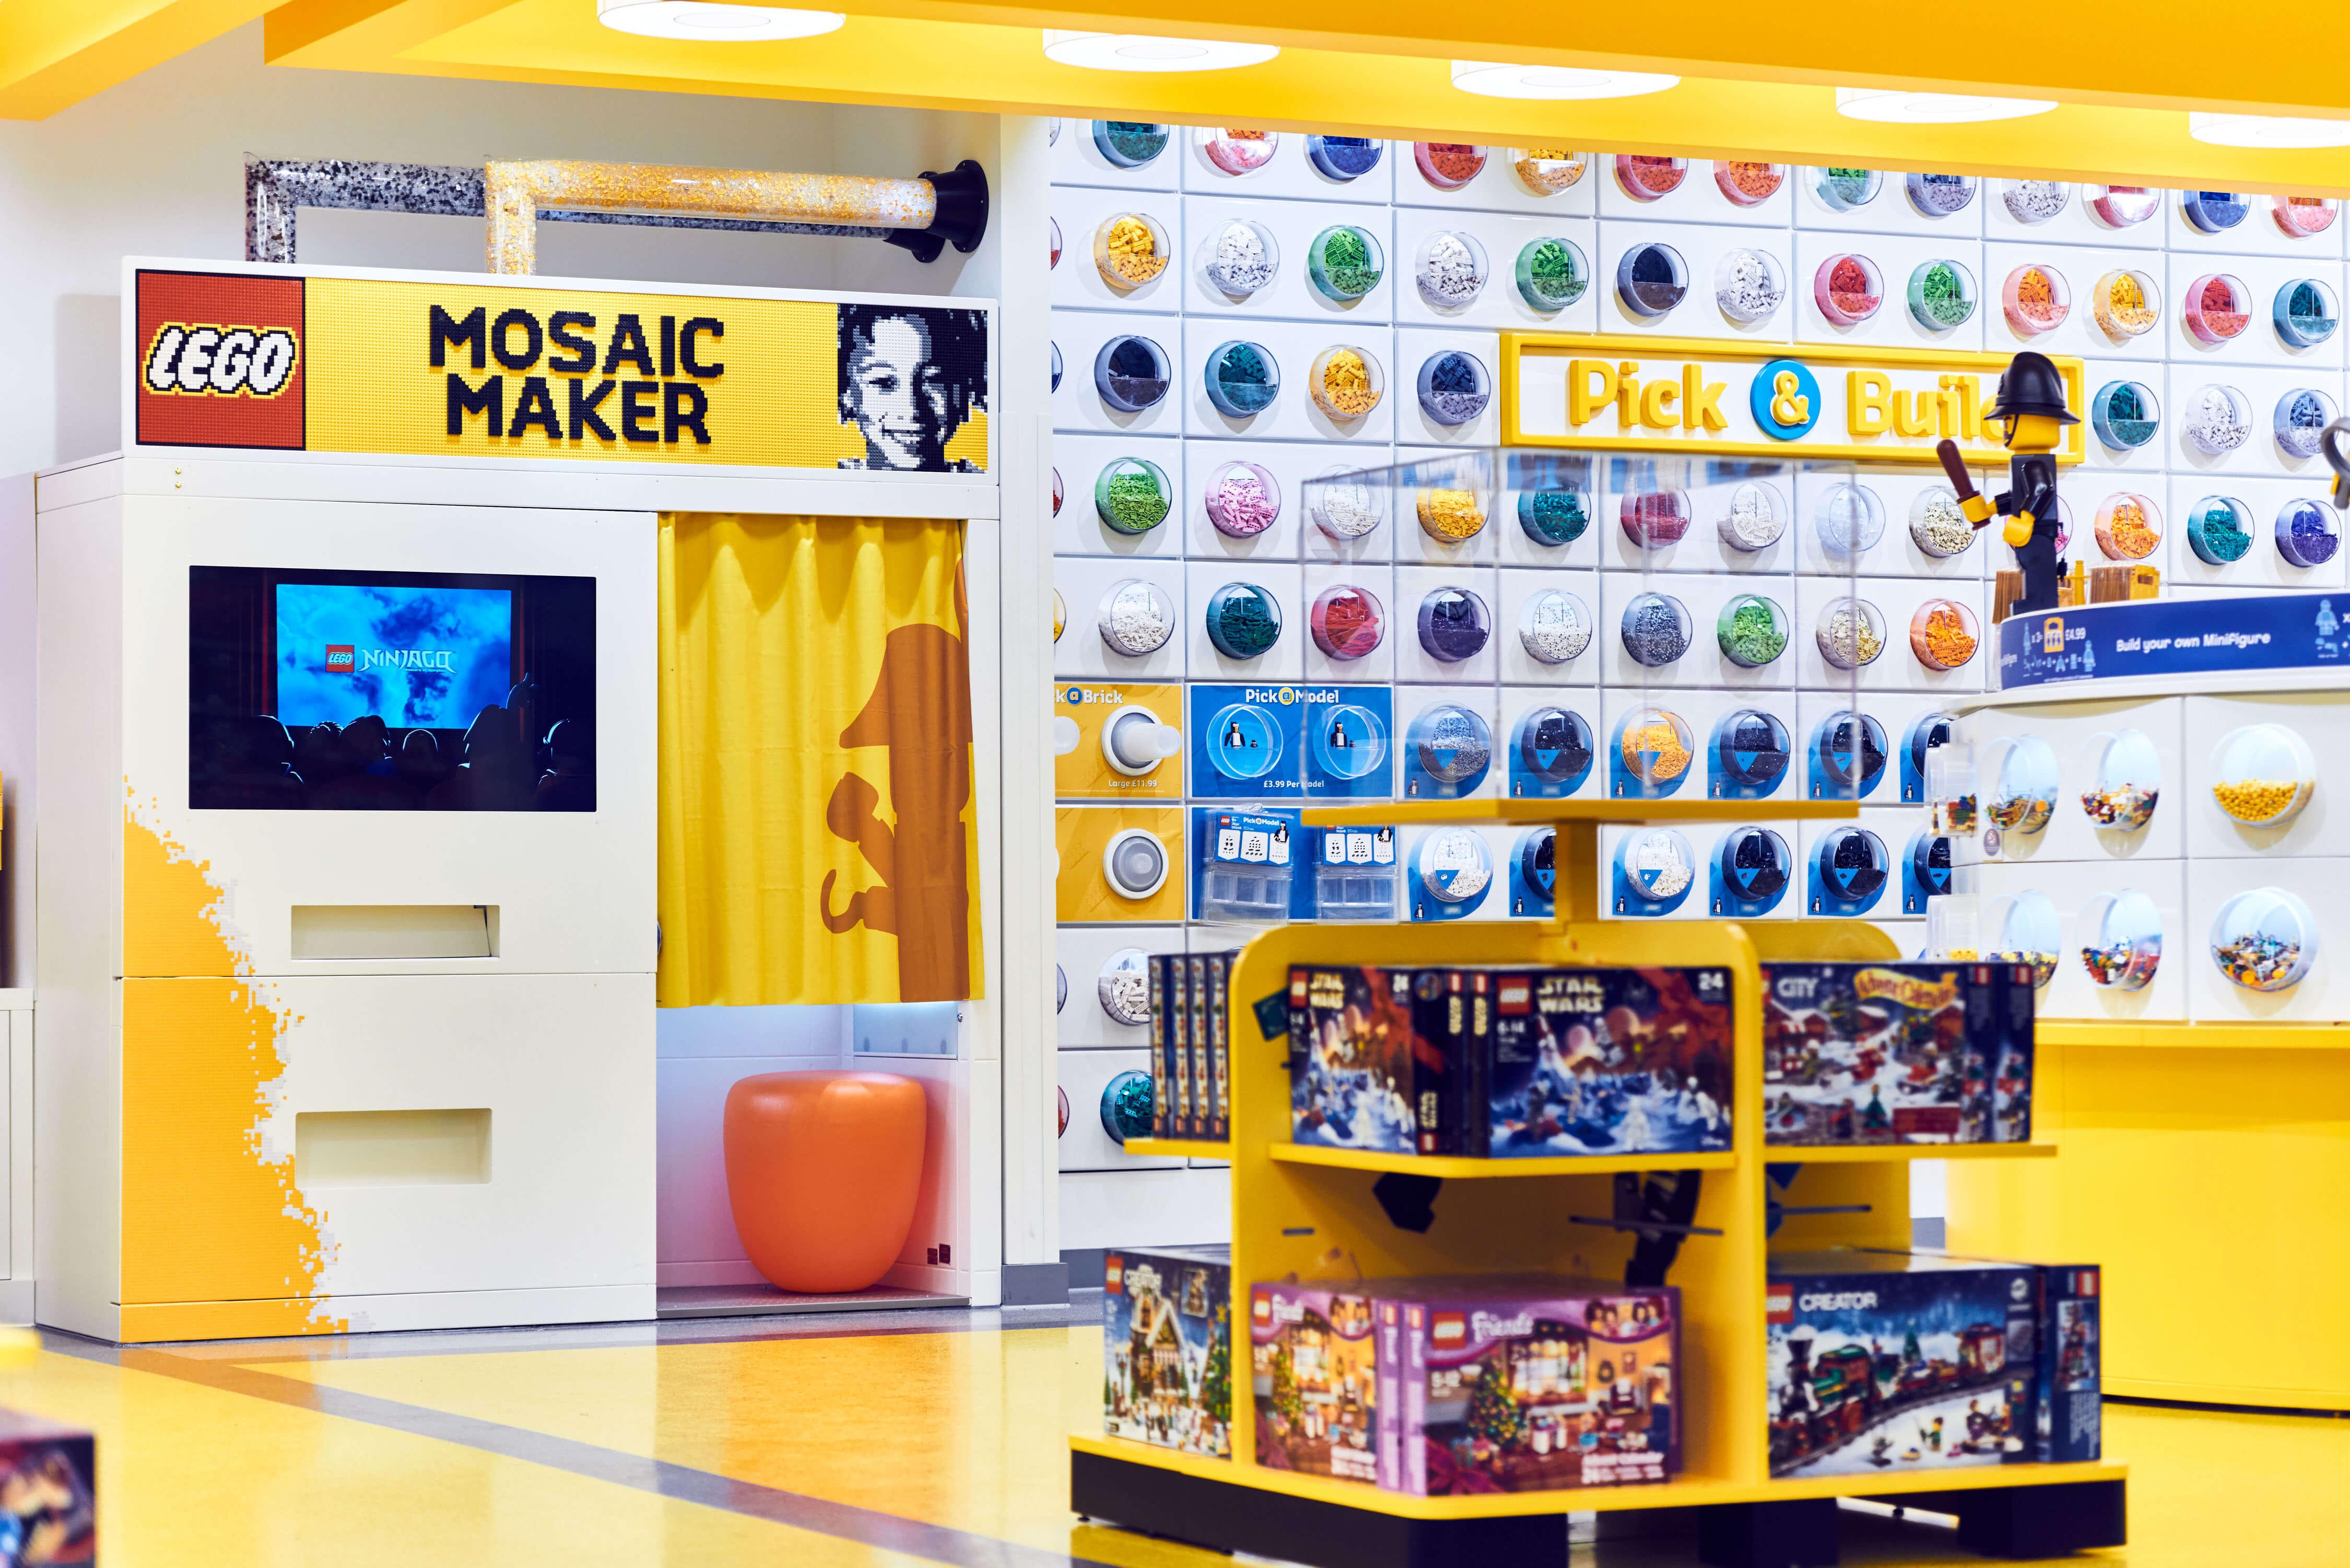 lego-mosaic-maker